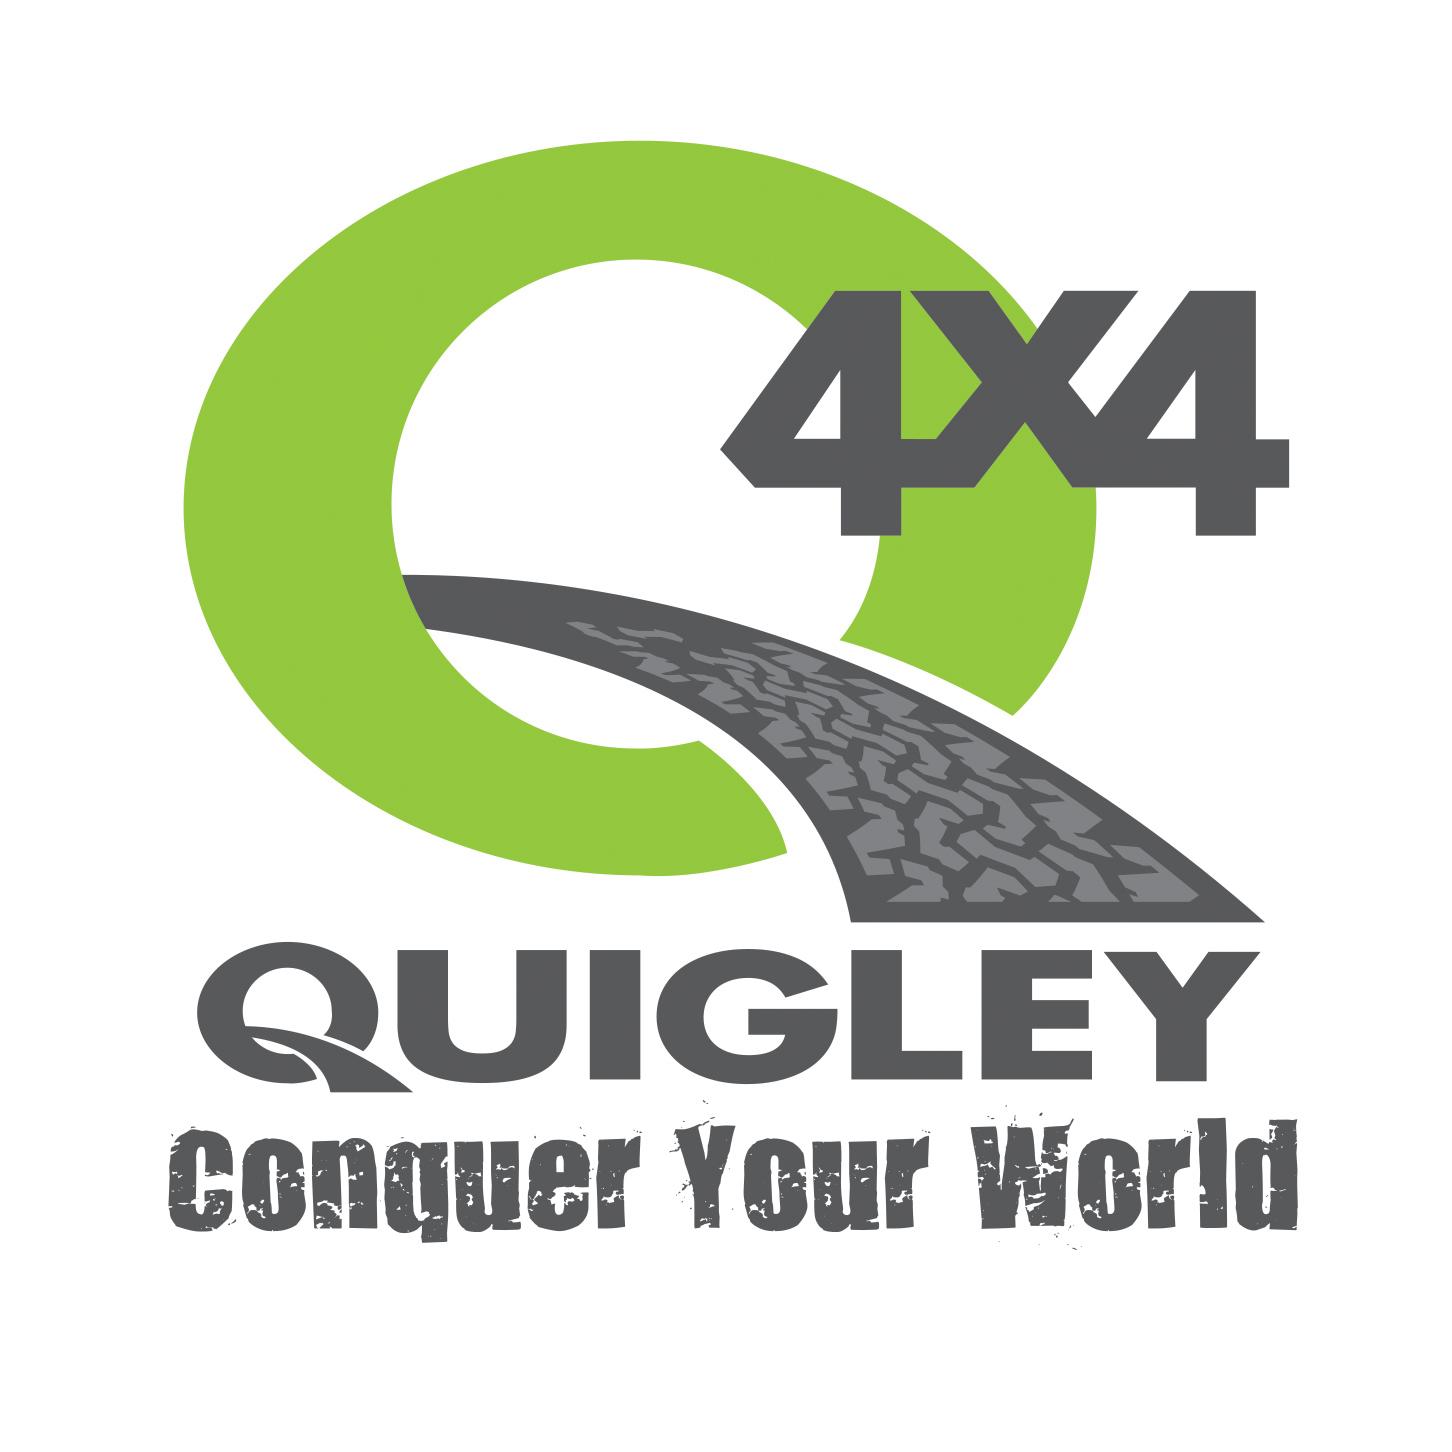 QuigleyLogo.jpg